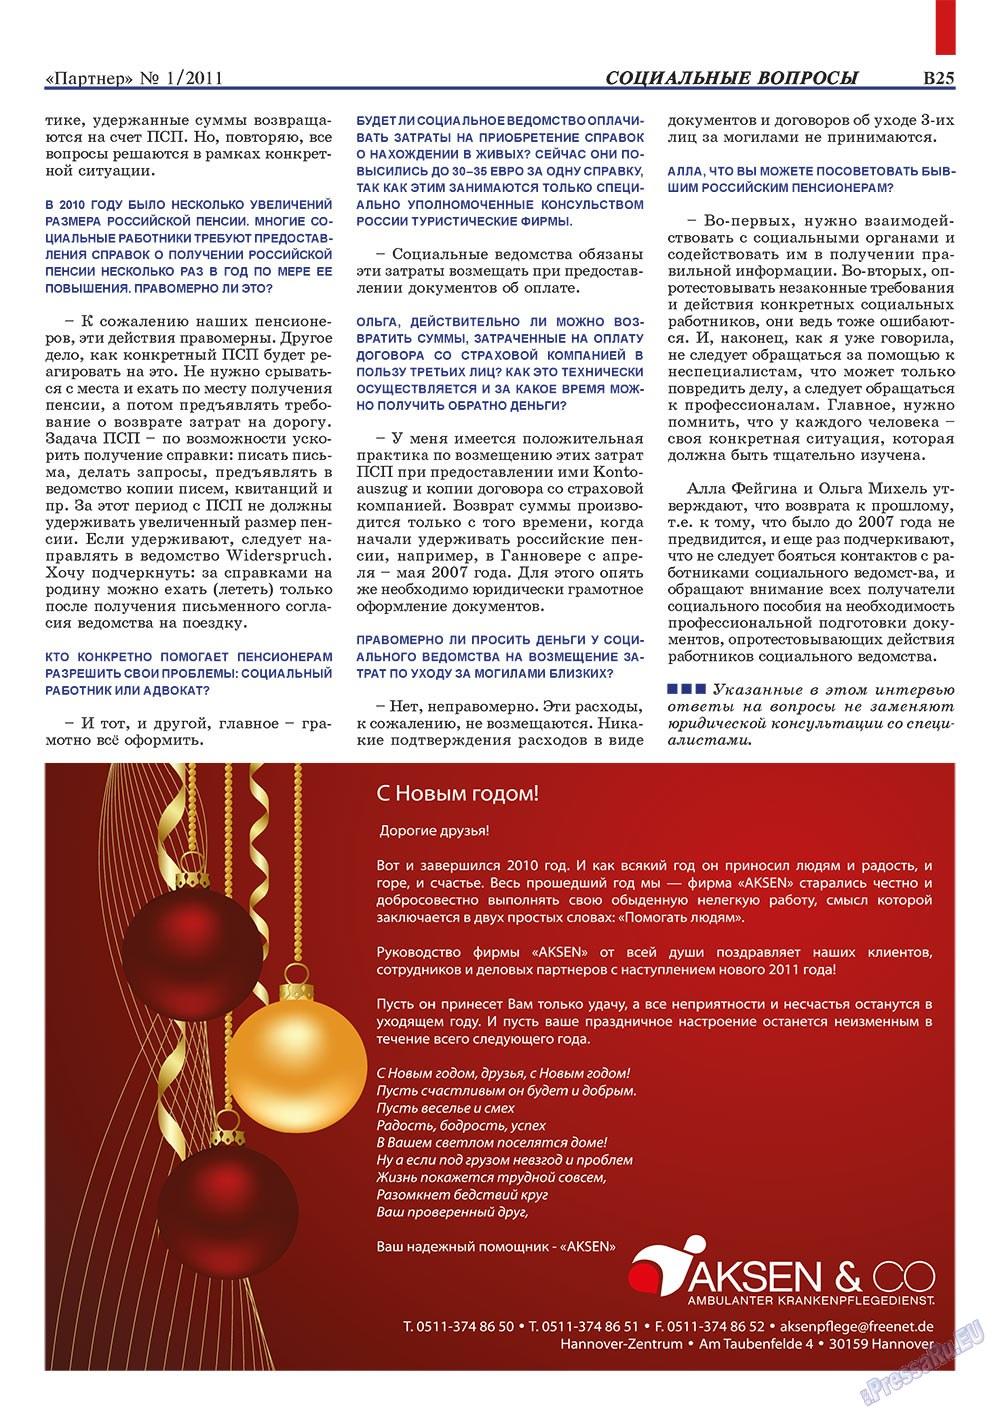 Партнер-север (журнал). 2011 год, номер 1, стр. 35